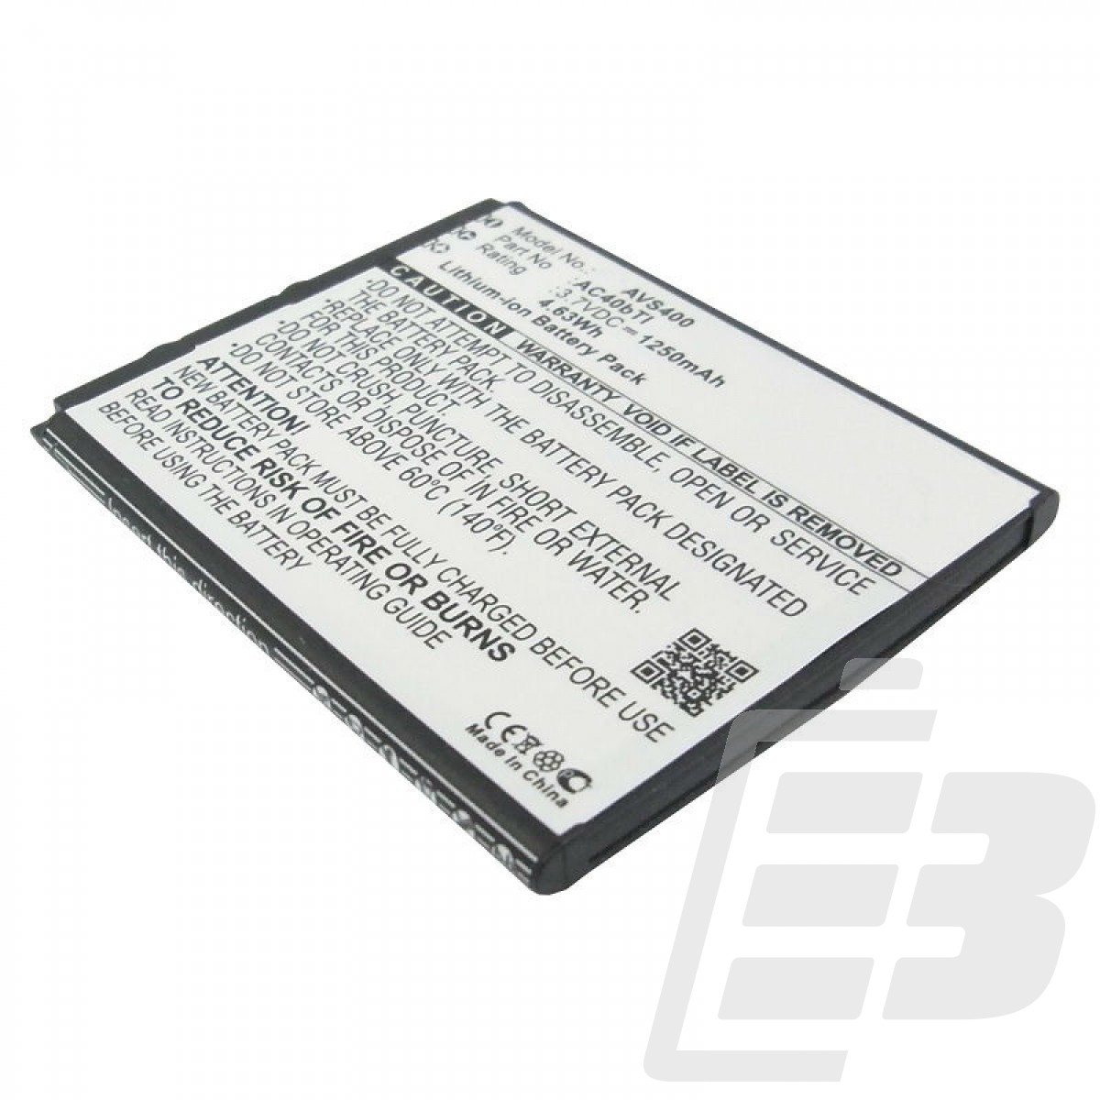 Smartphone battery Archos 40b Titanium_1